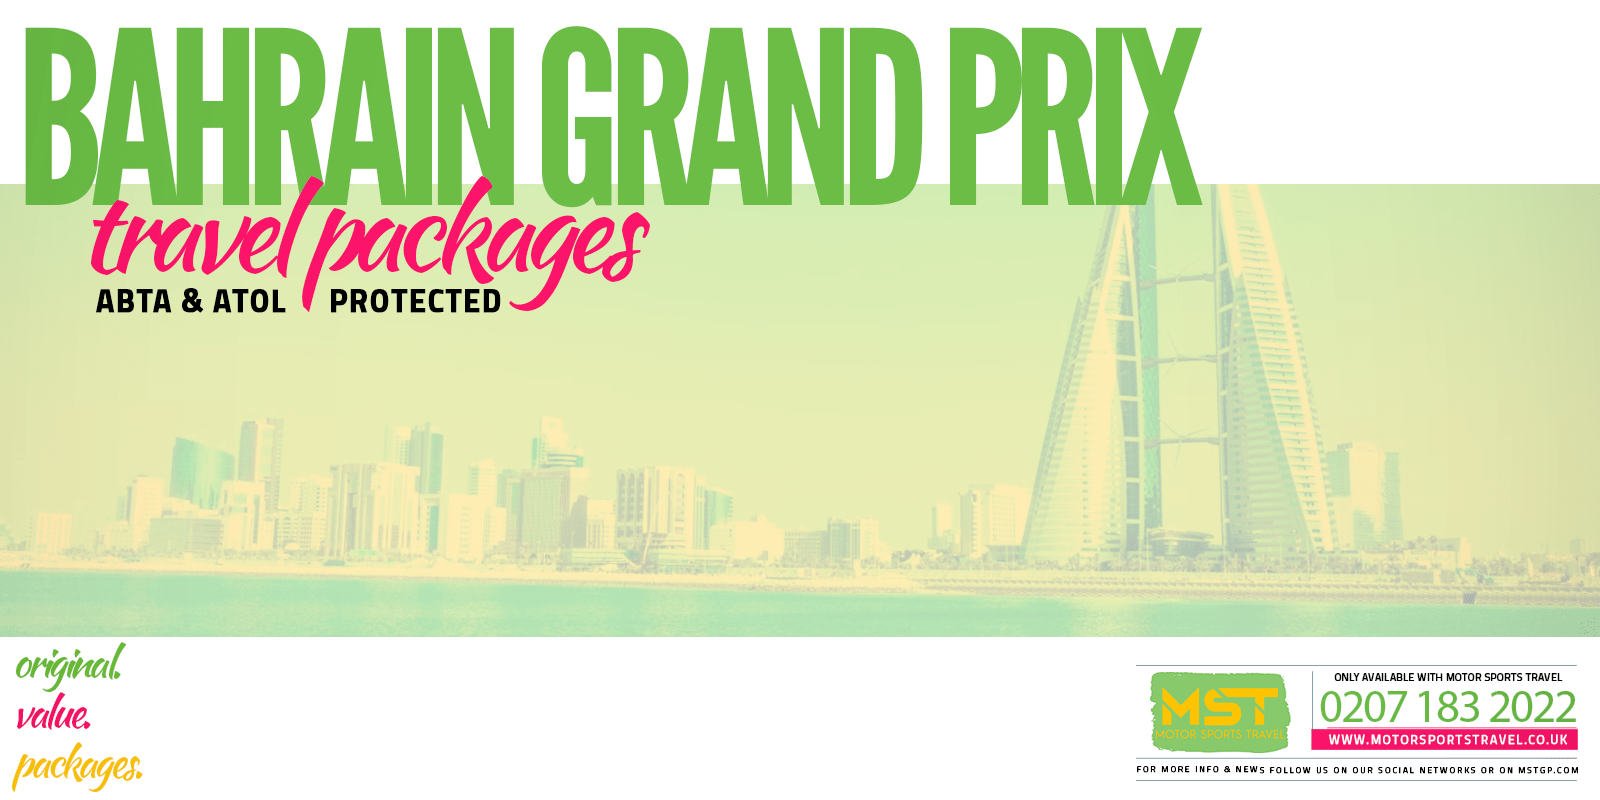 2020 Bahrain Grand Prix FORMULA 1 Packages | Motor Sports Travel